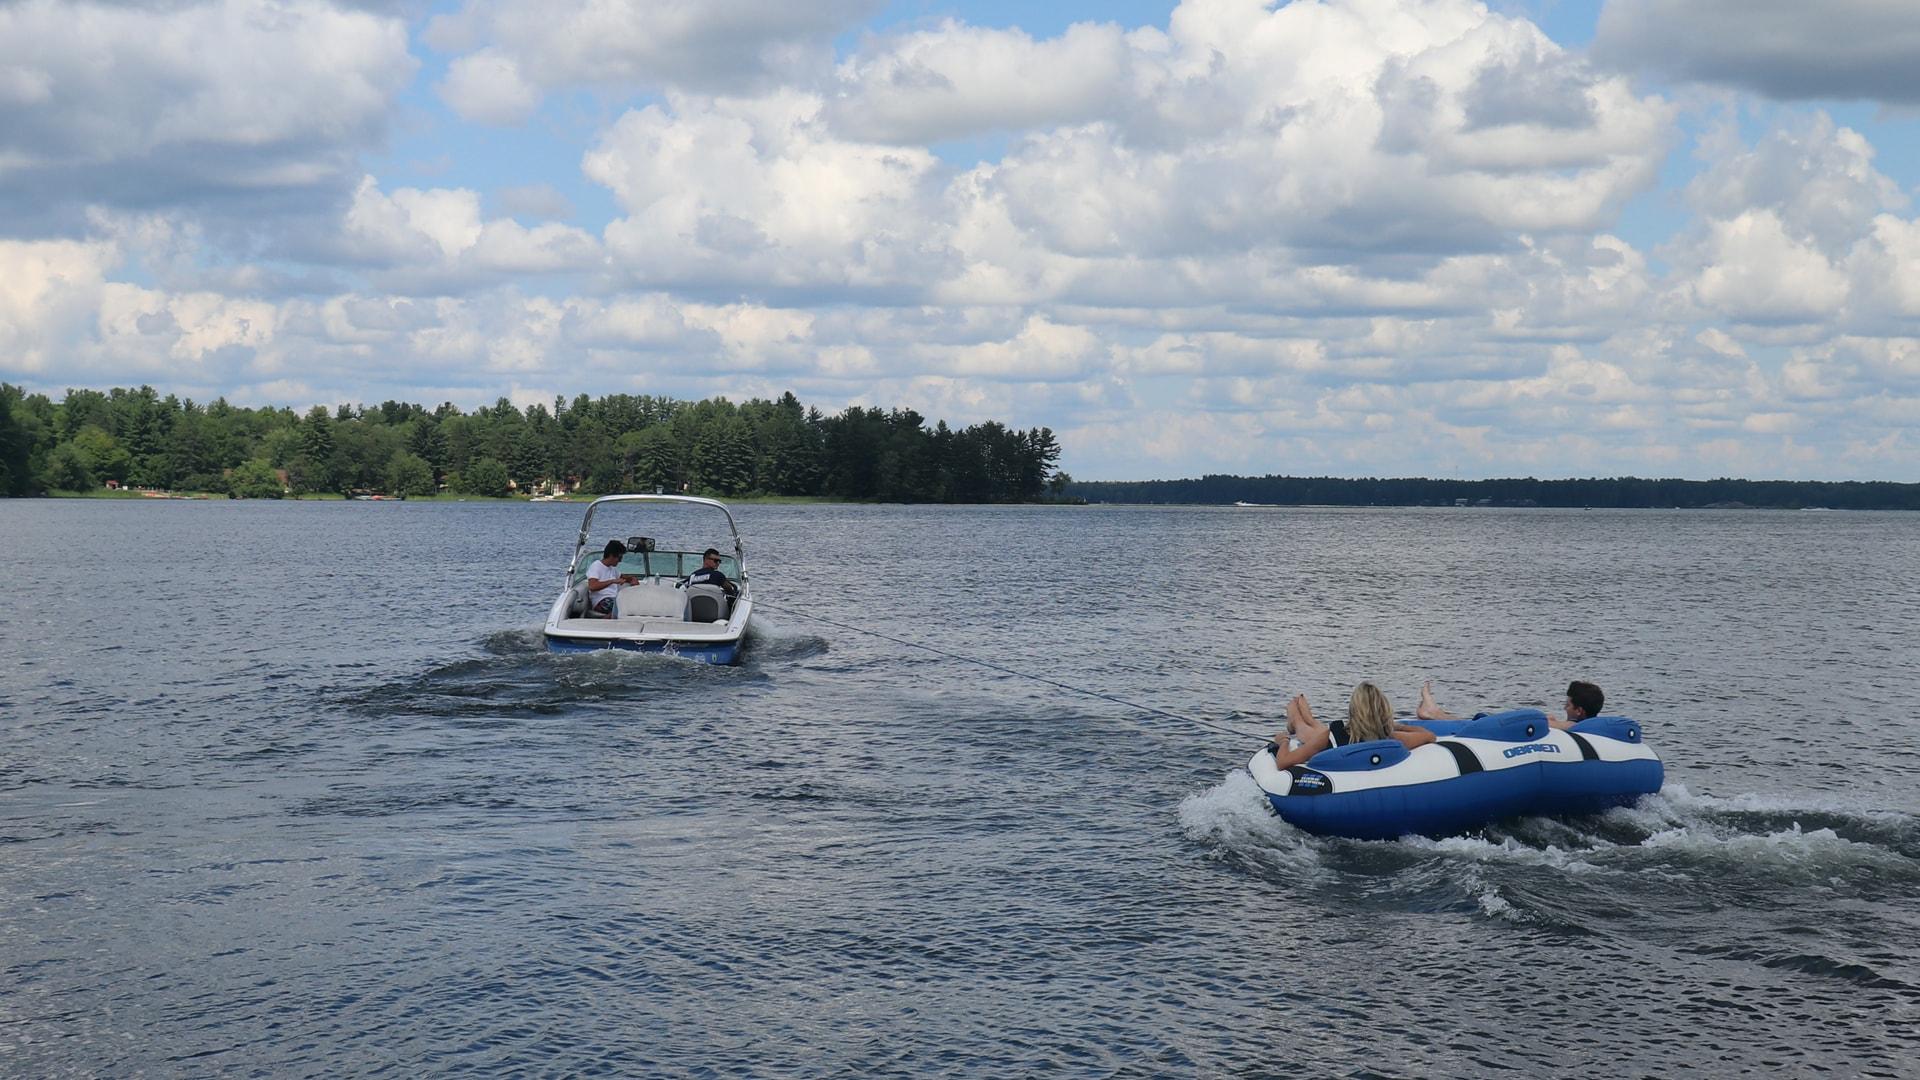 bayview tubing min - Adventure Day 2.0